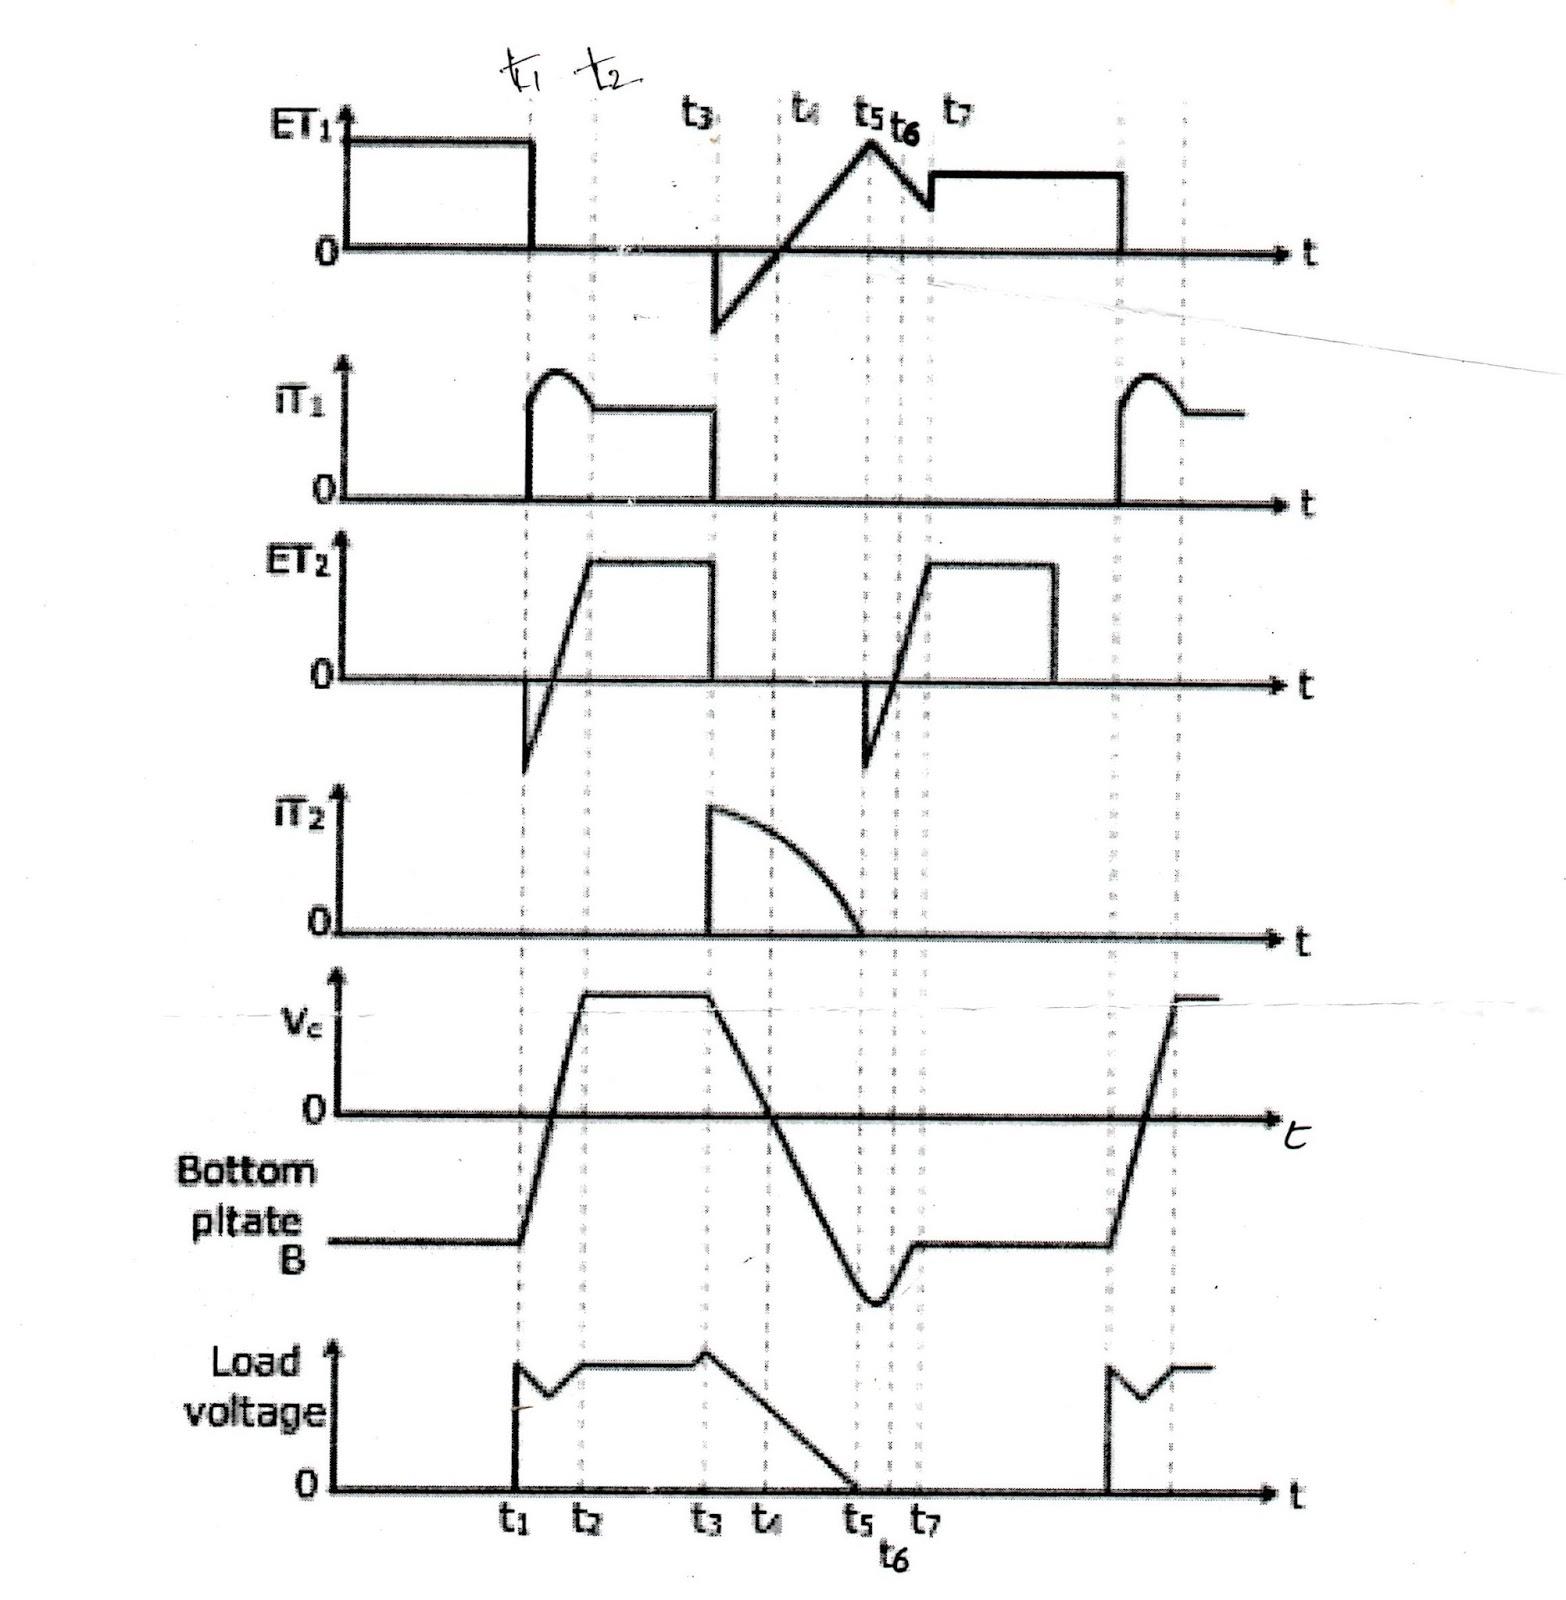 engineering notes jones chopper engineering notes deep fryer diagram circuit diagram jones chopper [ 1566 x 1600 Pixel ]